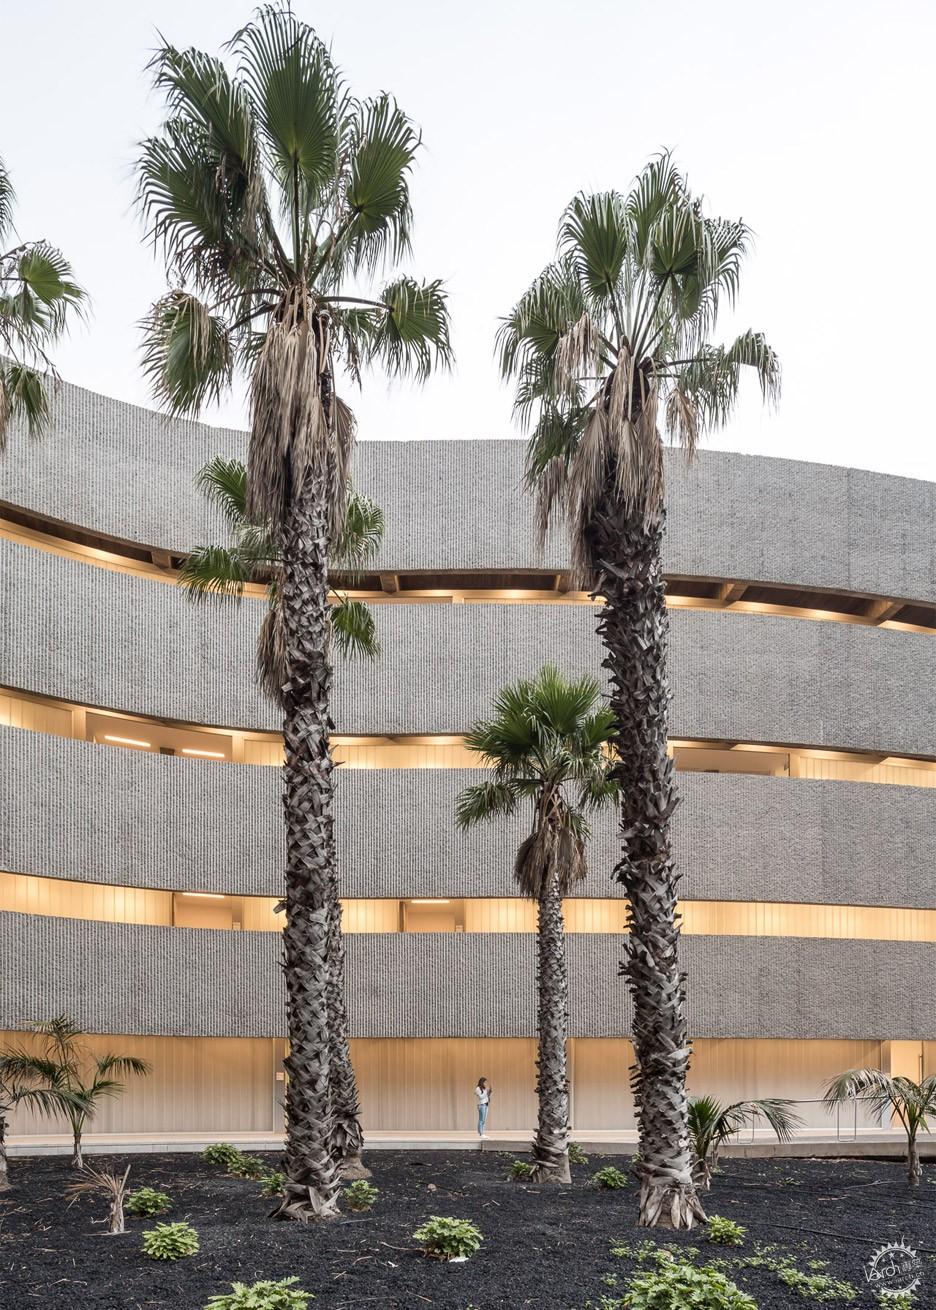 Tenerife波浪形的艺术学校/ GPY Arquitectos第7张图片